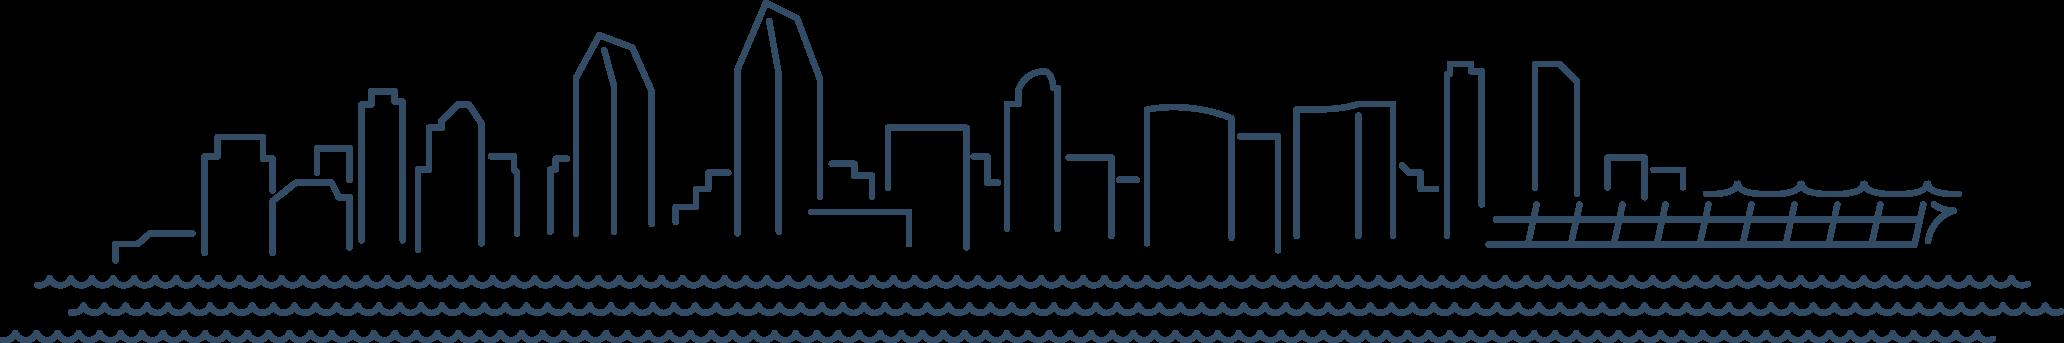 Perfil de San Diego